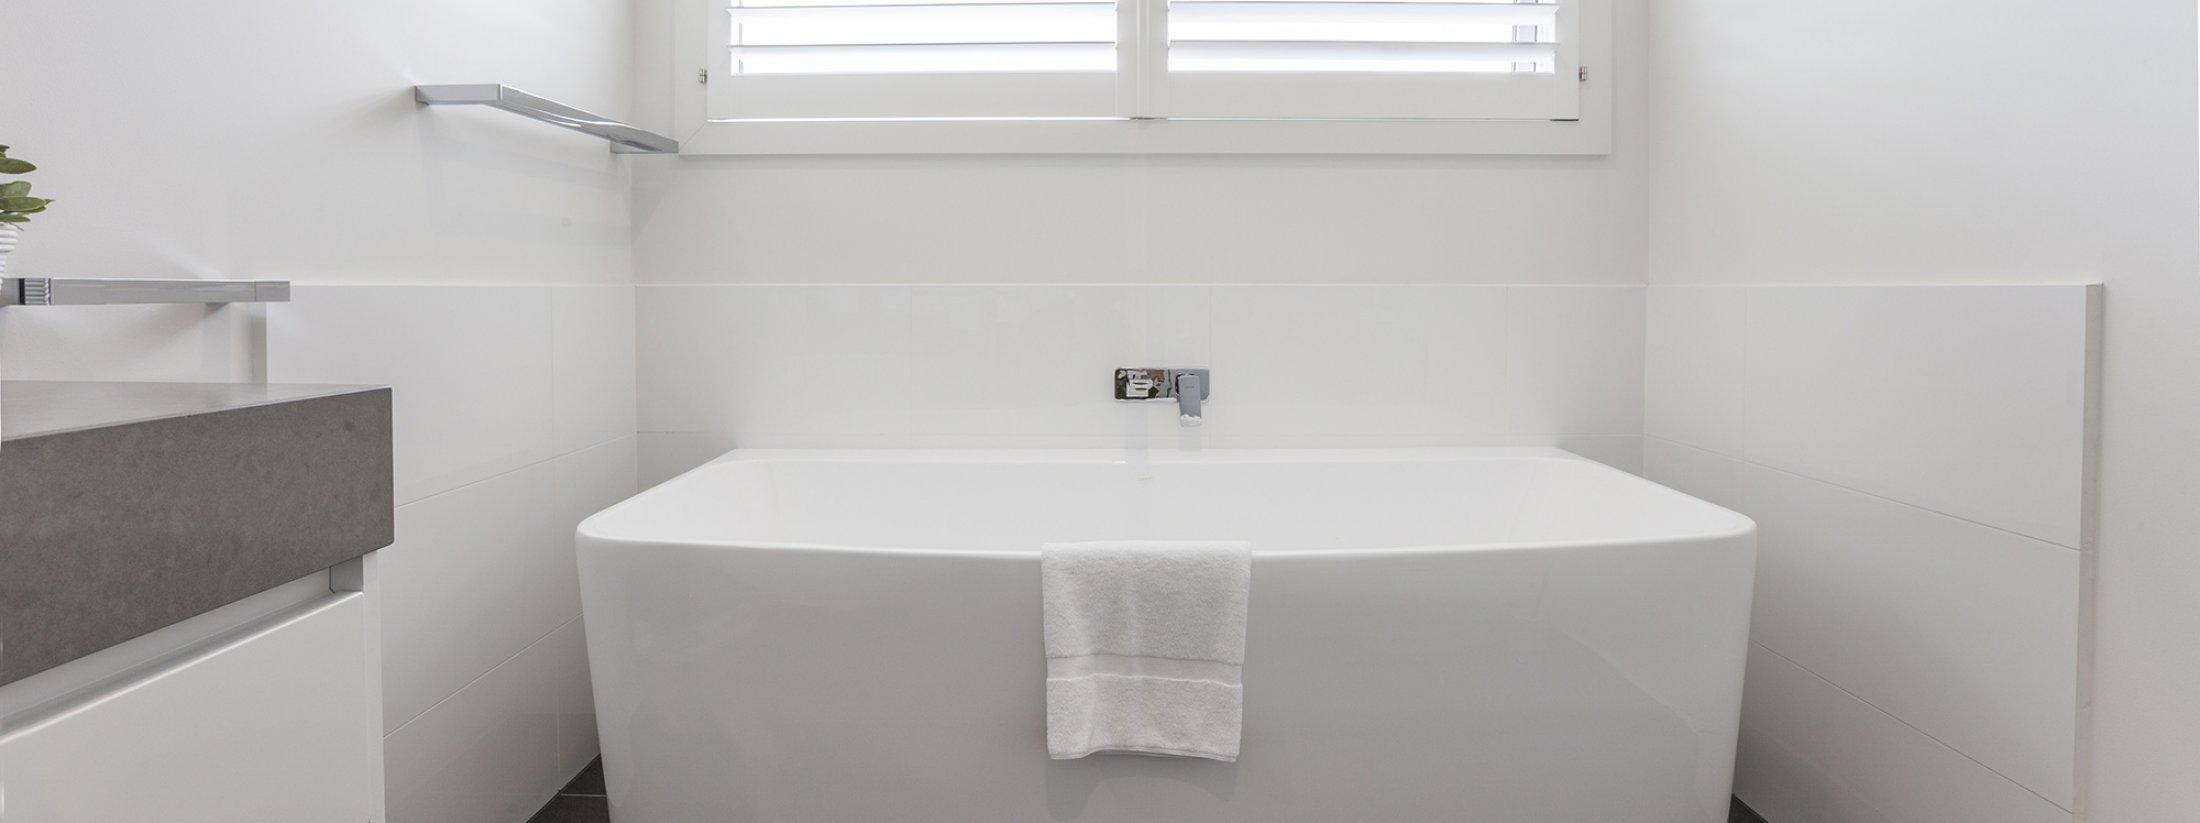 Contempo - Prahran - Bathroom